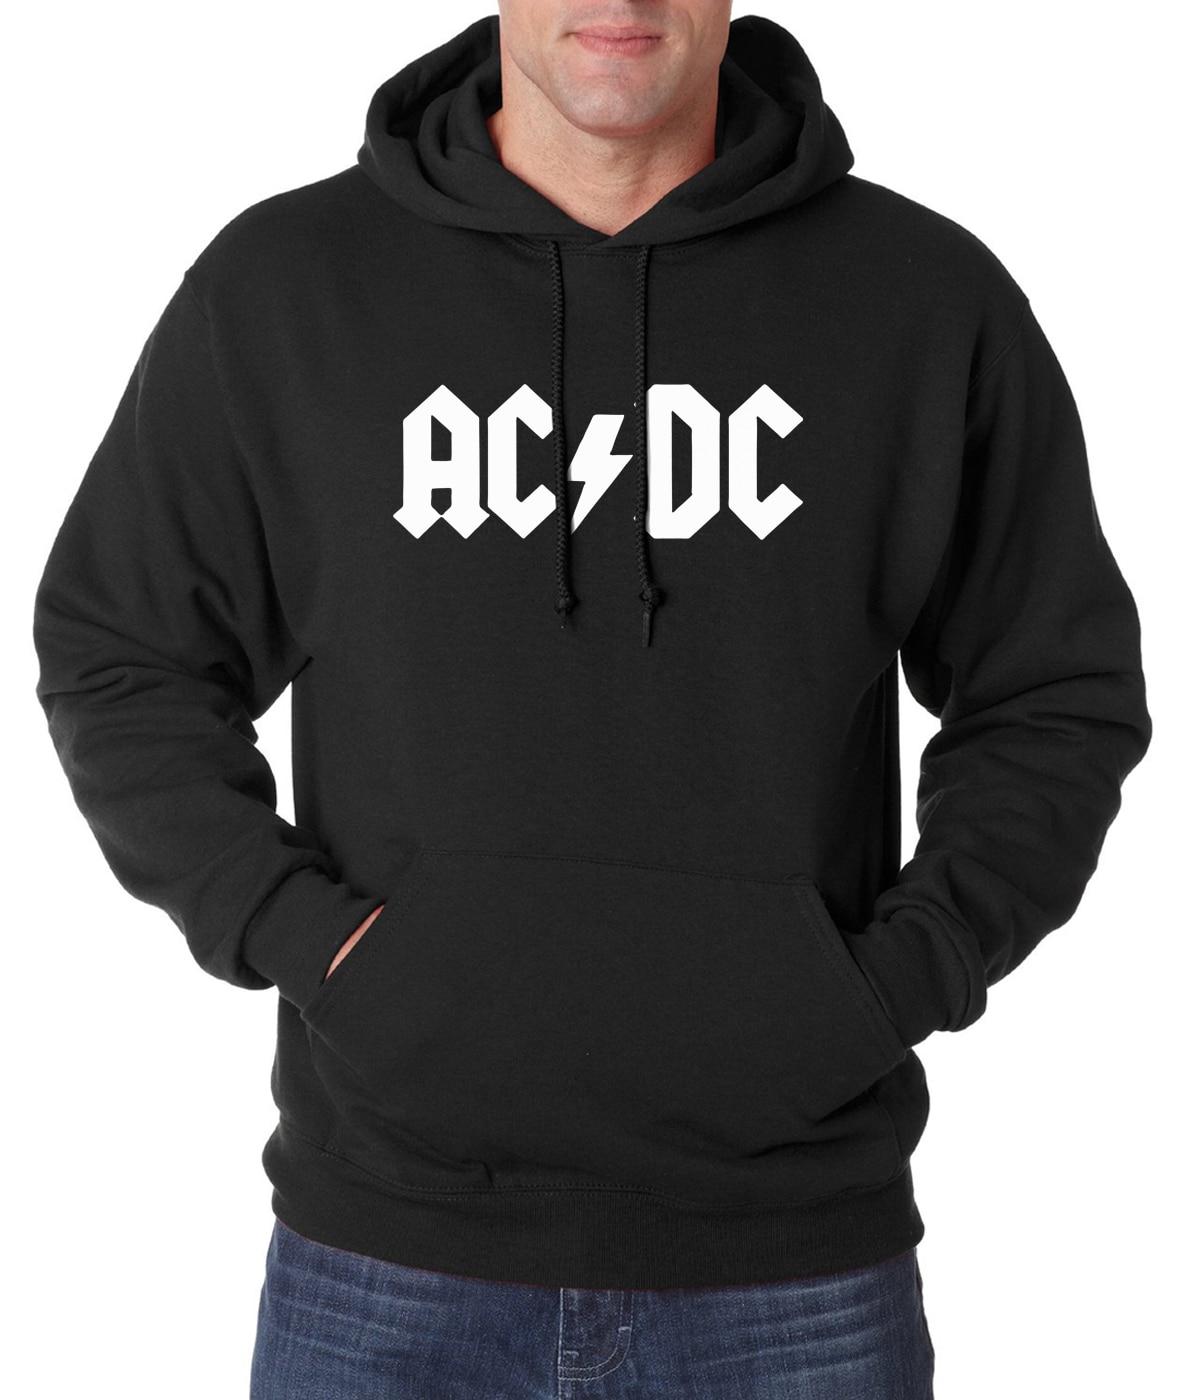 Cheap dc hoodies